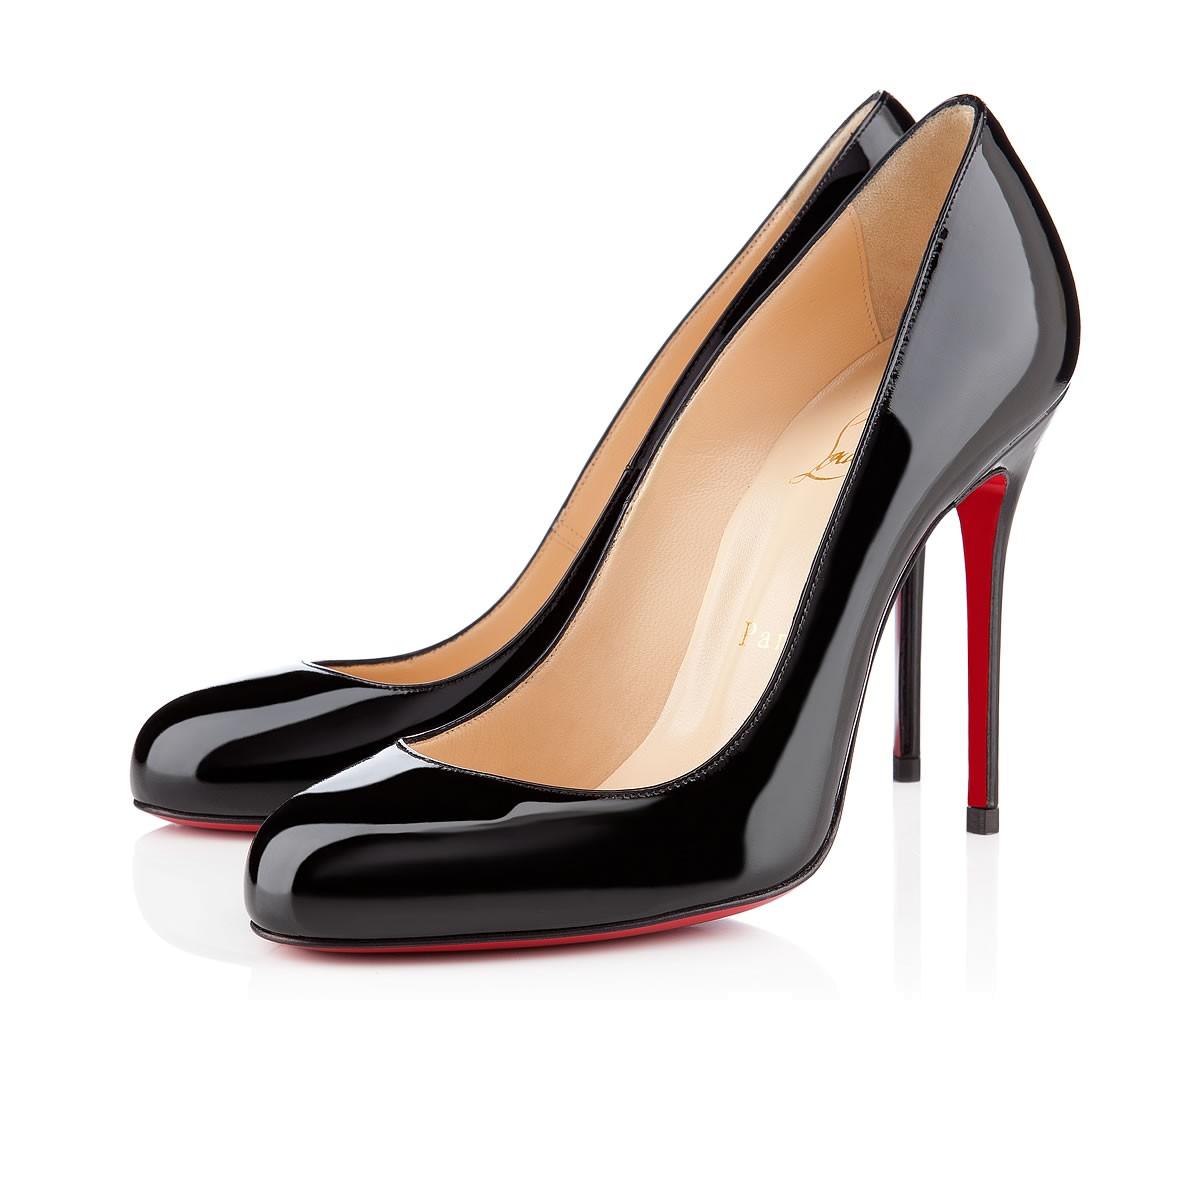 christian louboutin heels, Christian Louboutin Love Me